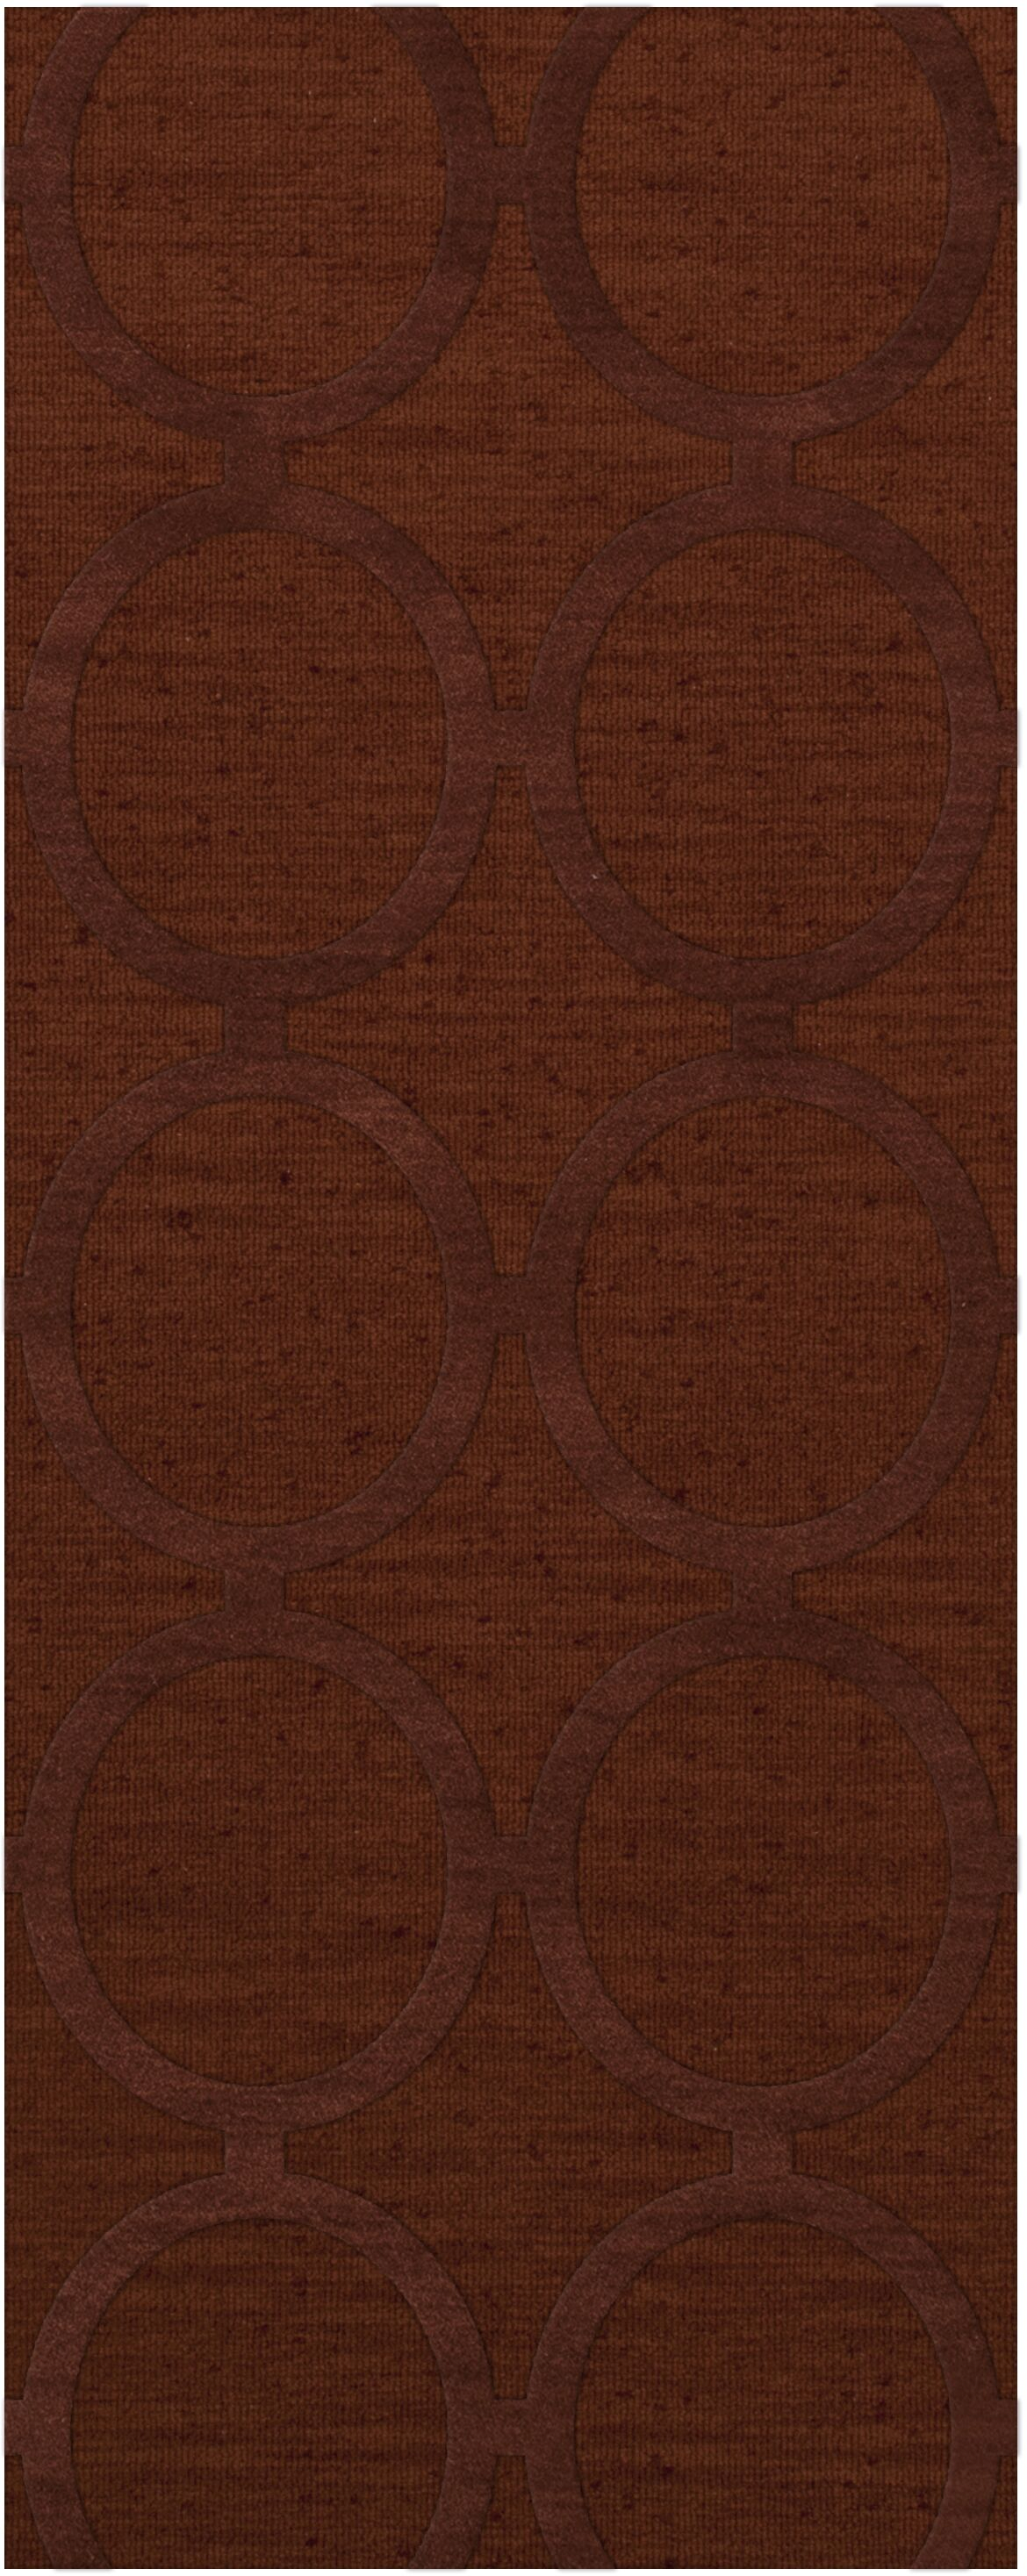 Dover Tufted Wool Paprika Area Rug Rug Size: Runner 2'6